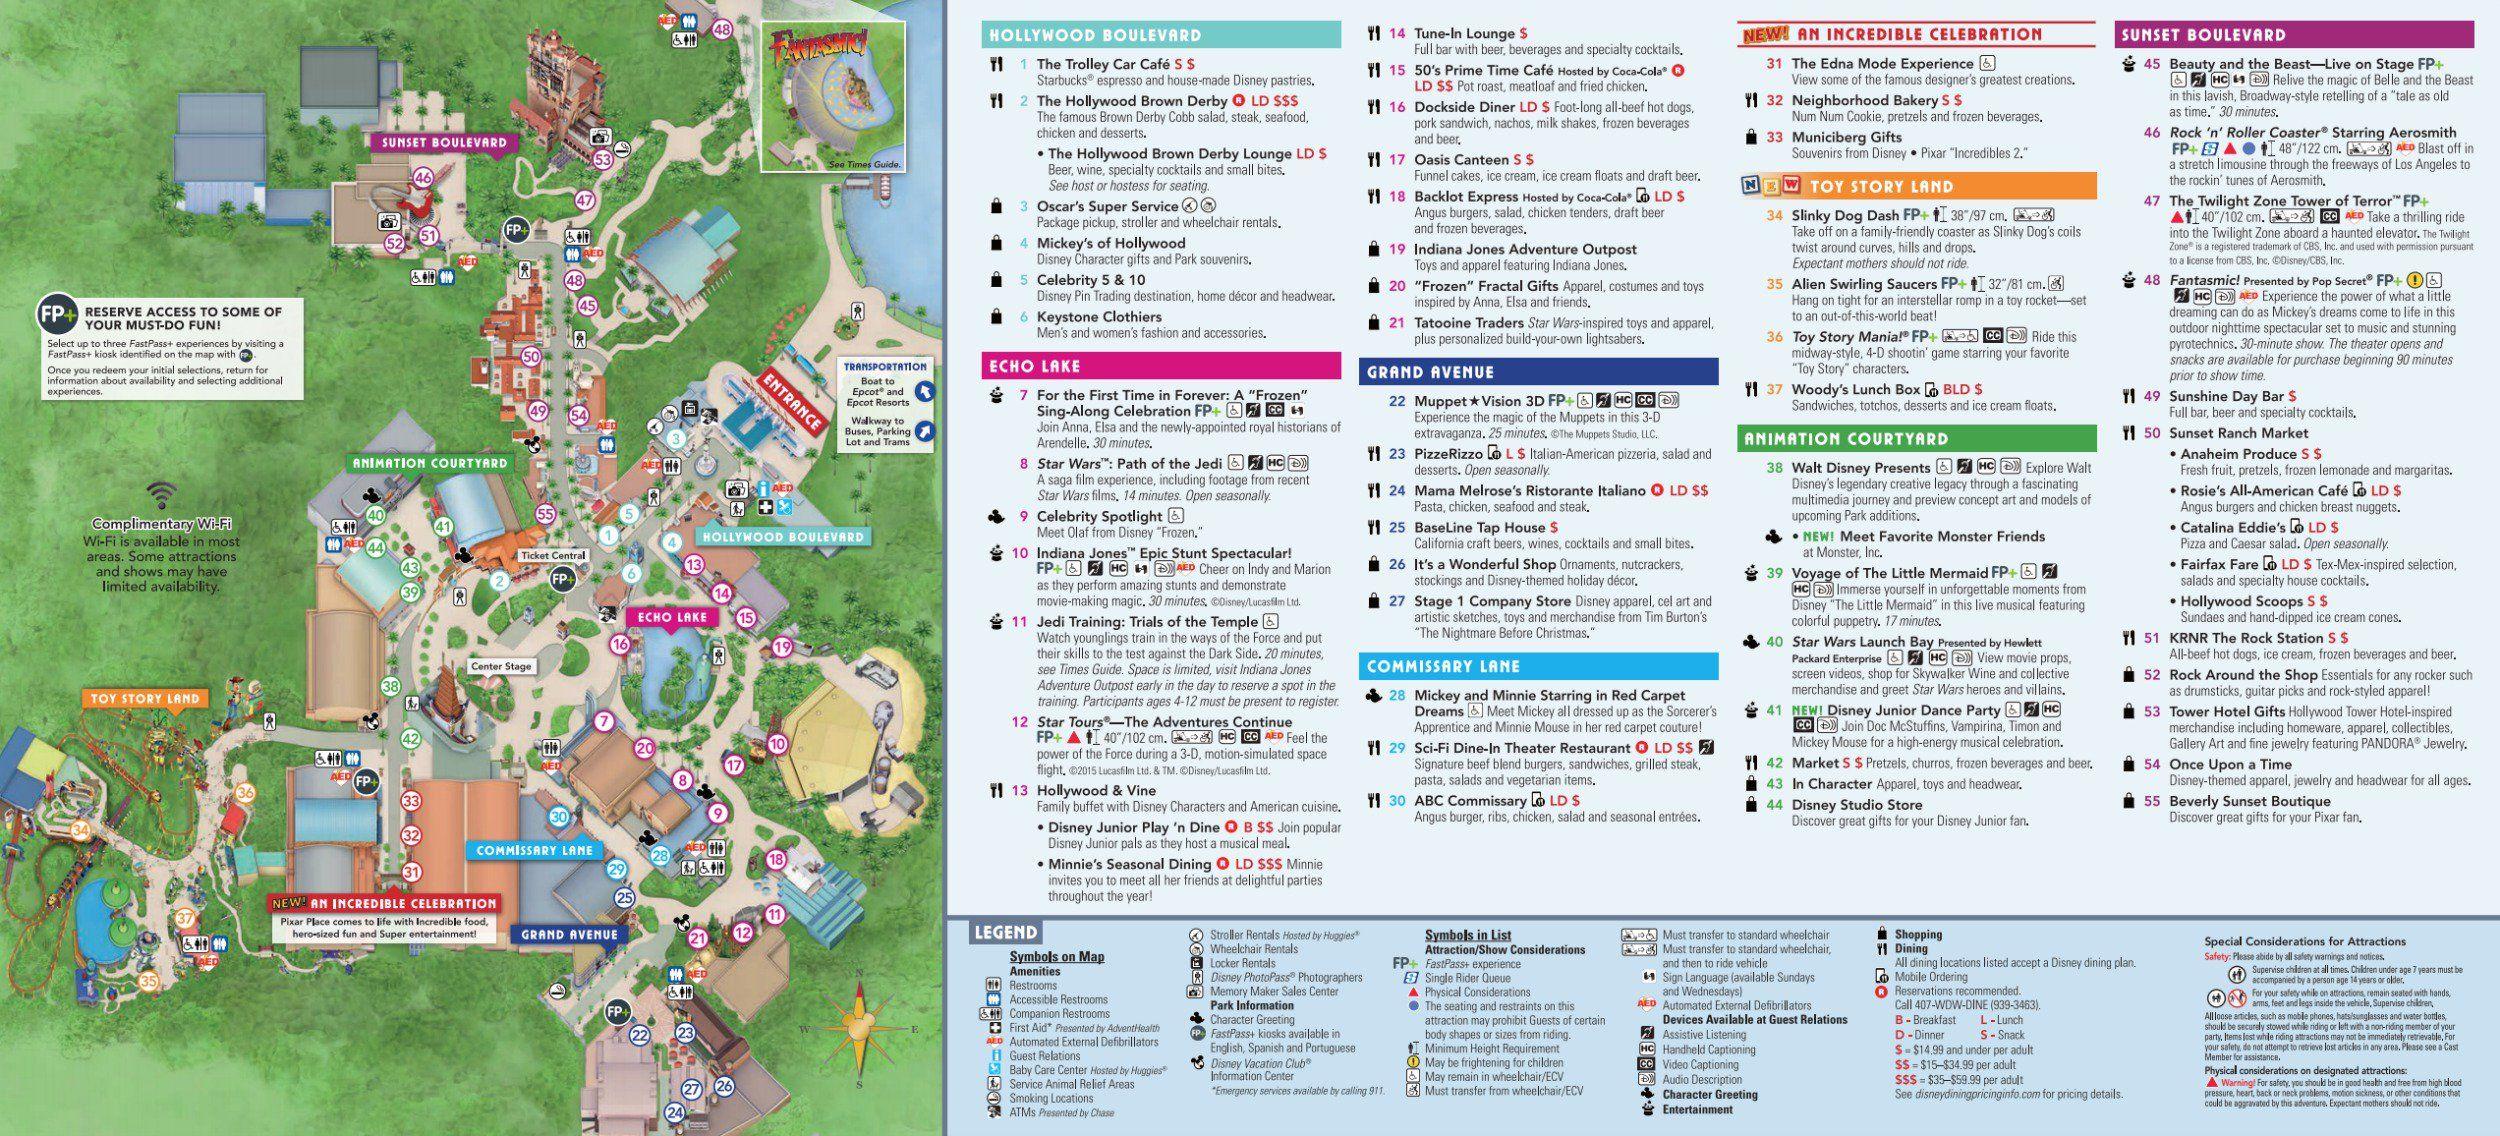 Map Of Hollywood Studios Florida Disney Hollywood Studios Map Upd. 1/19   Disney world map